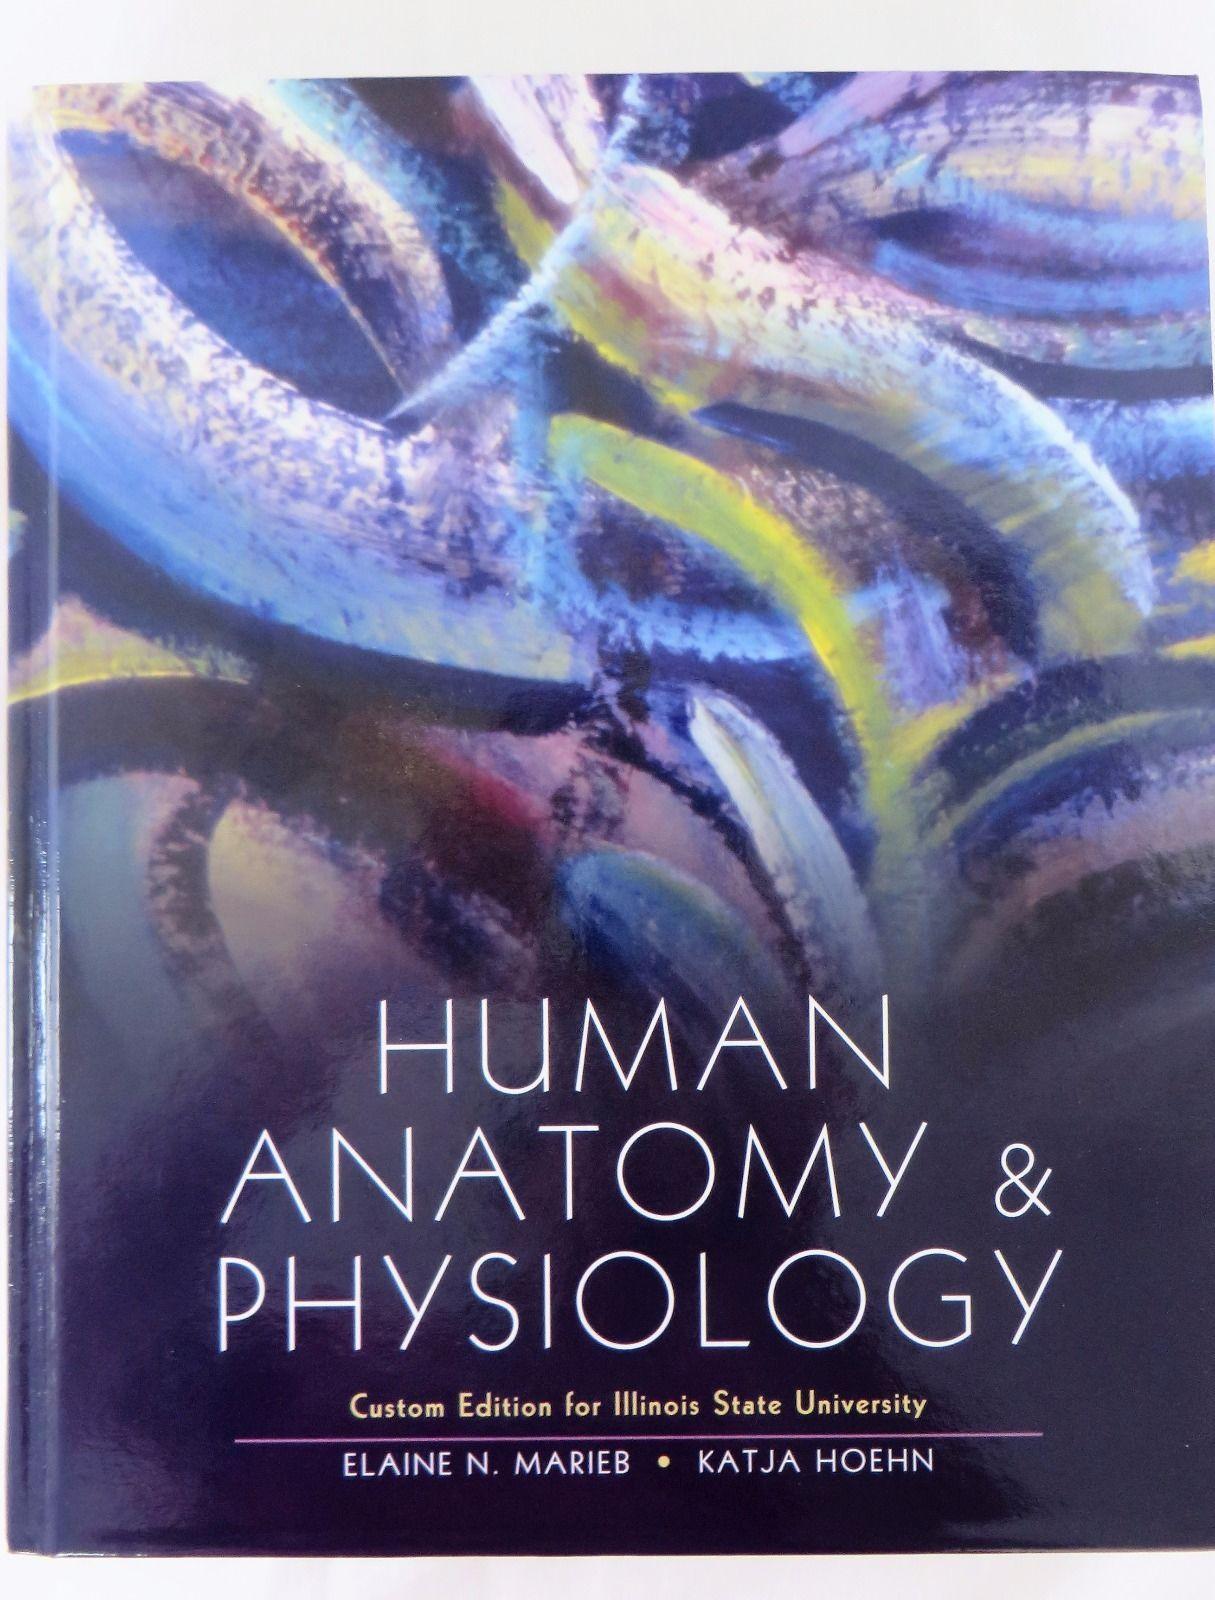 Human Anatomy & Physiology Marieb Free and 9 similar items